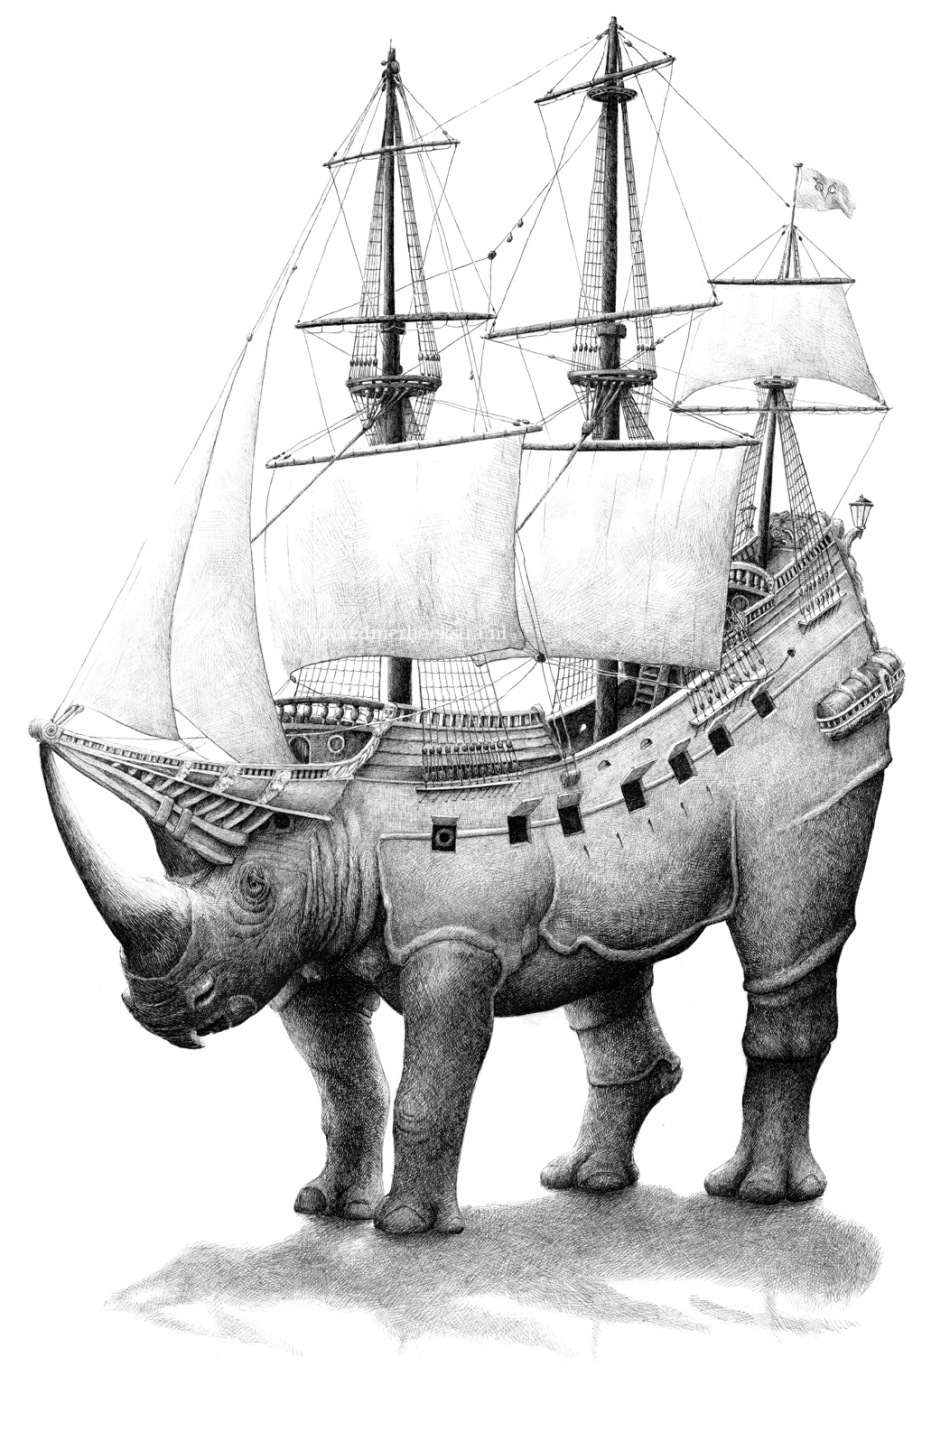 rhinoship by Redmer Hoekstra